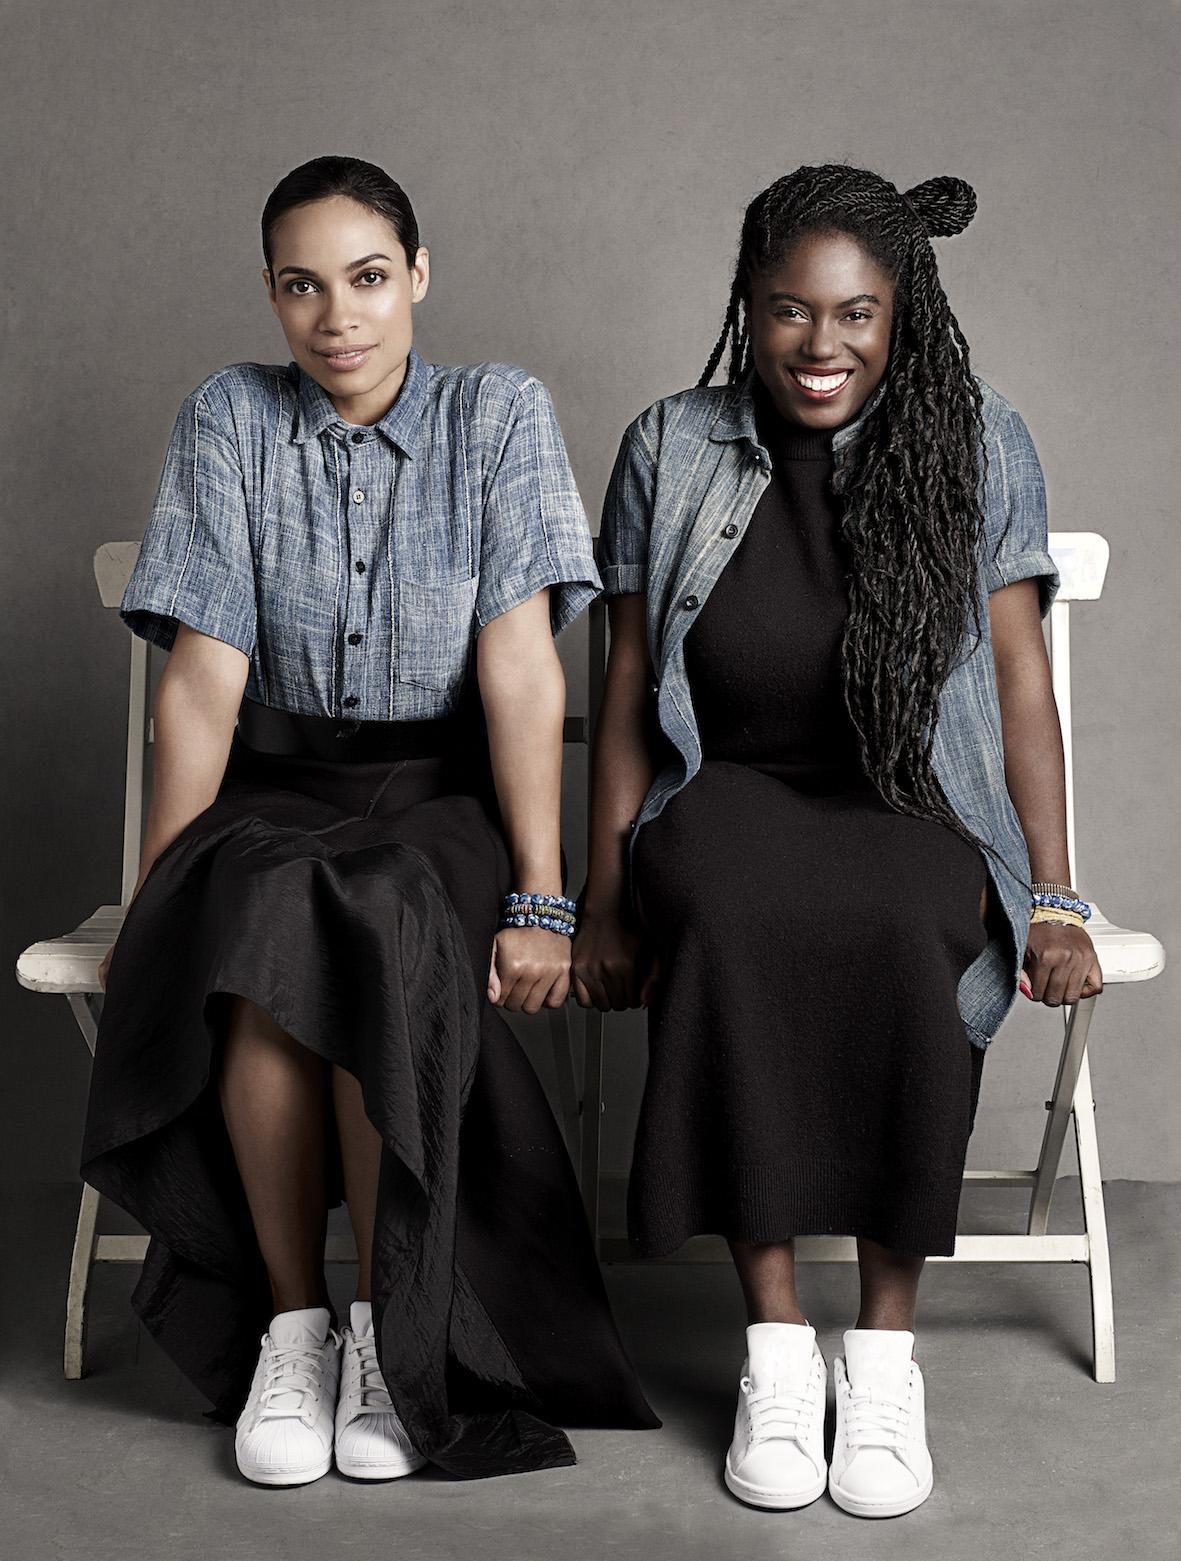 Rosario Dawson & Abrima Erwiah, photographed by Joshua Jordan